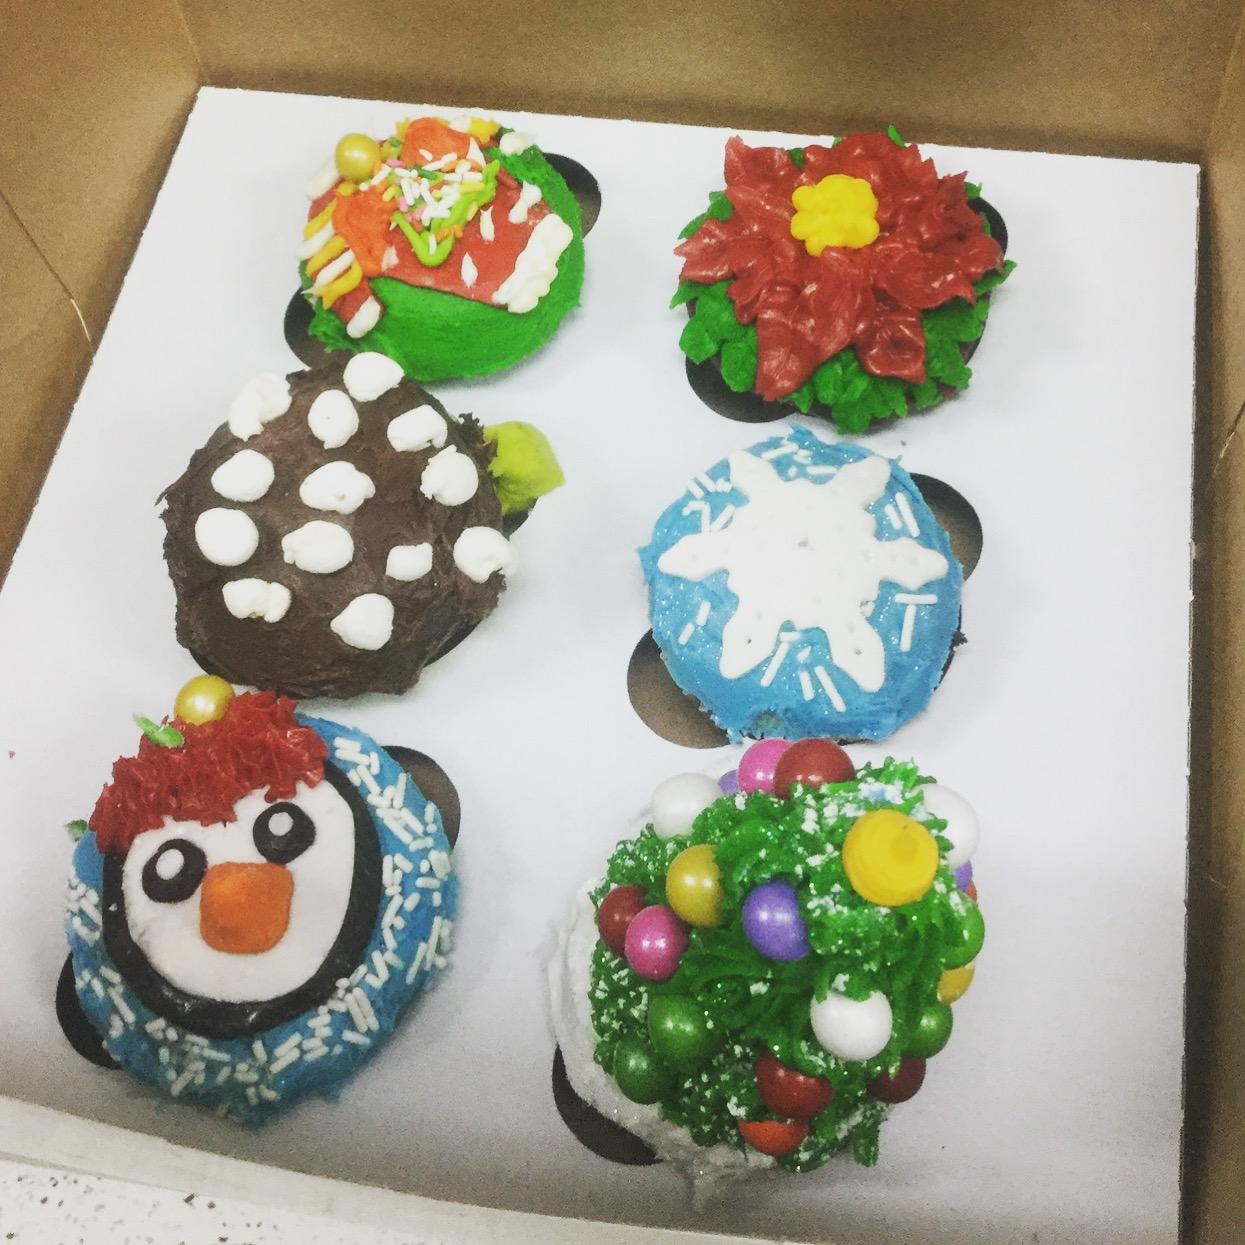 January 18th Cupcake Class